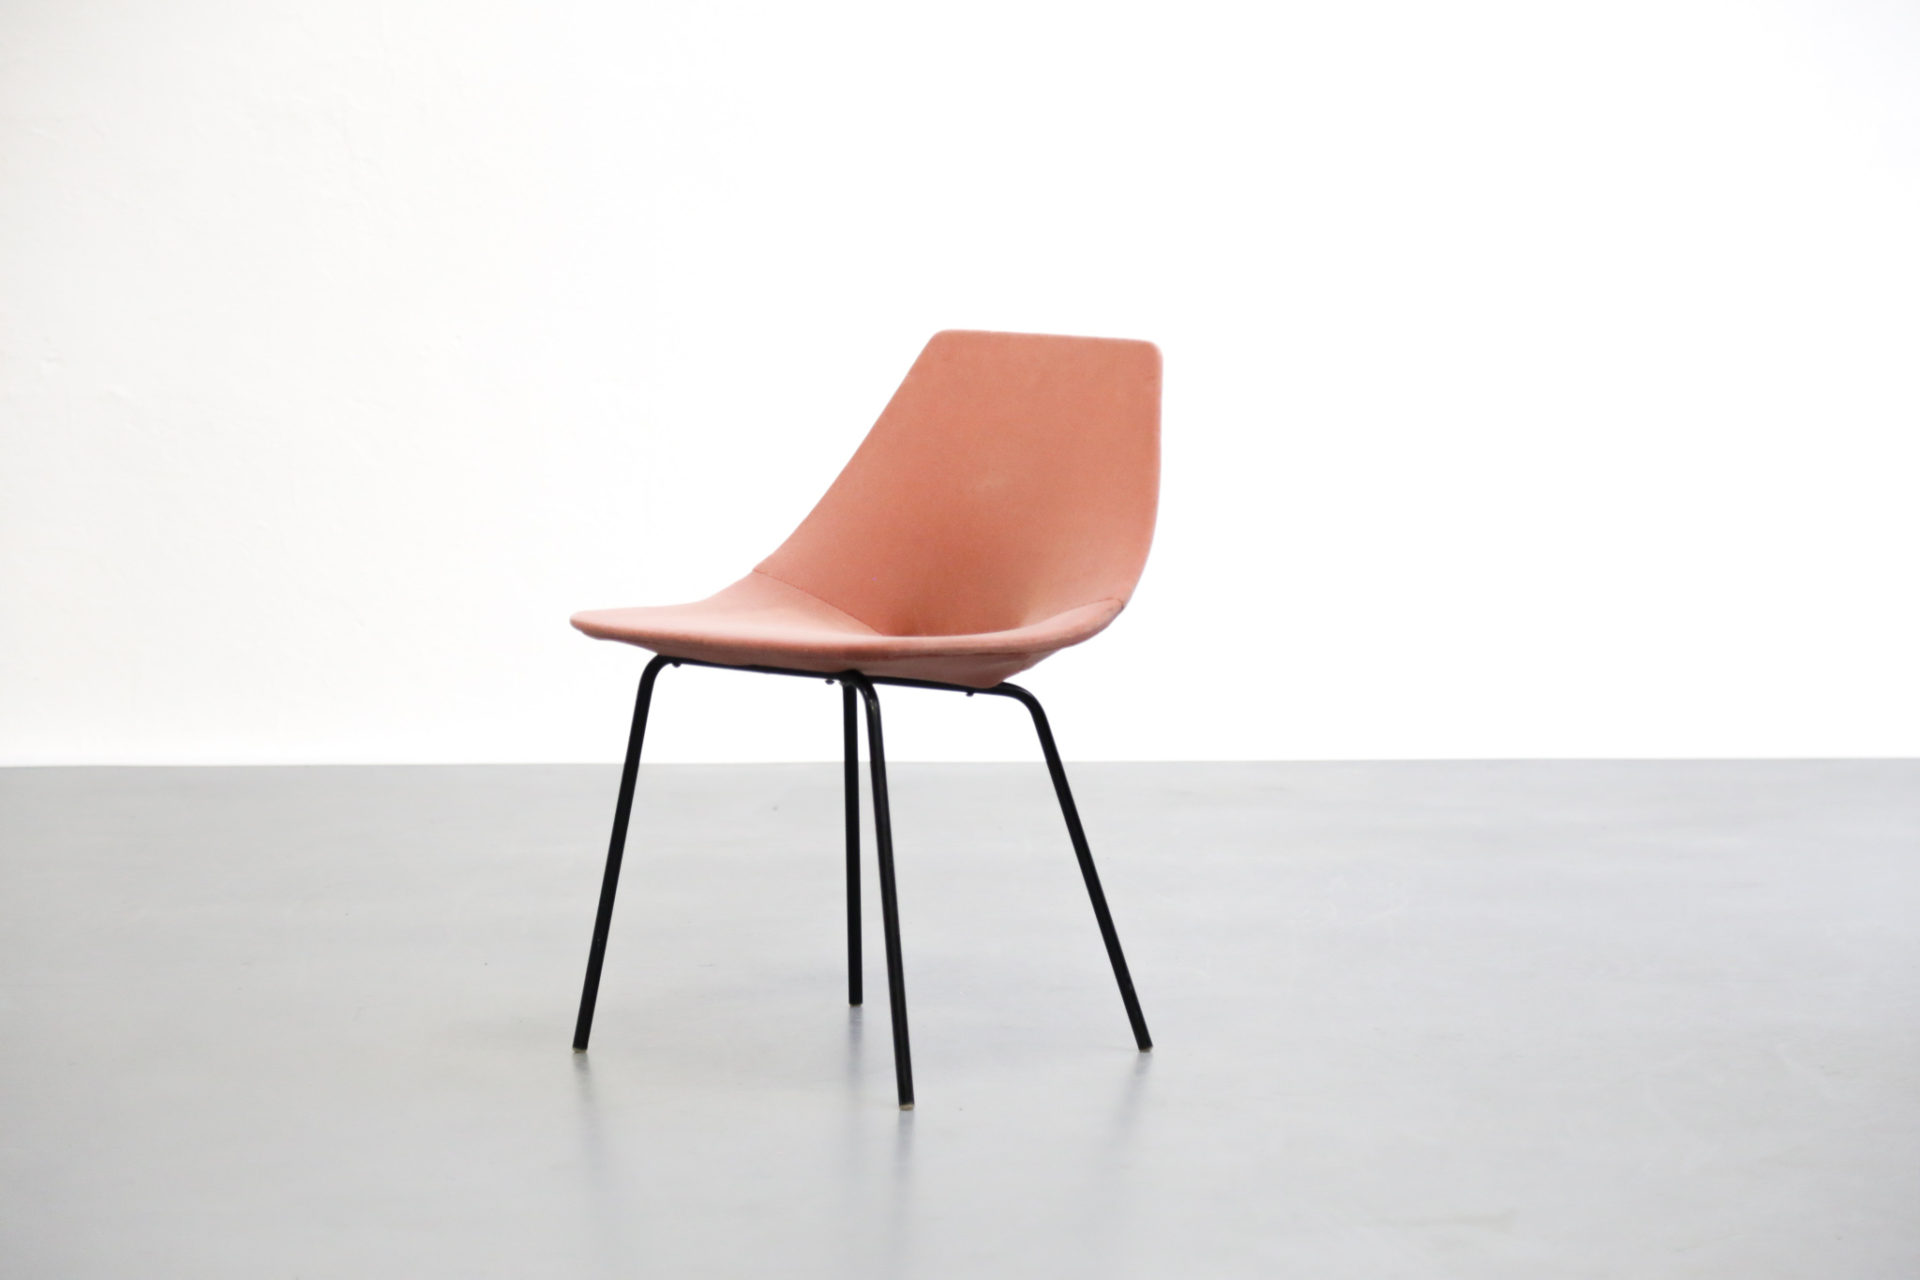 Chaise Tonneau Pierre Guariche french design chair2